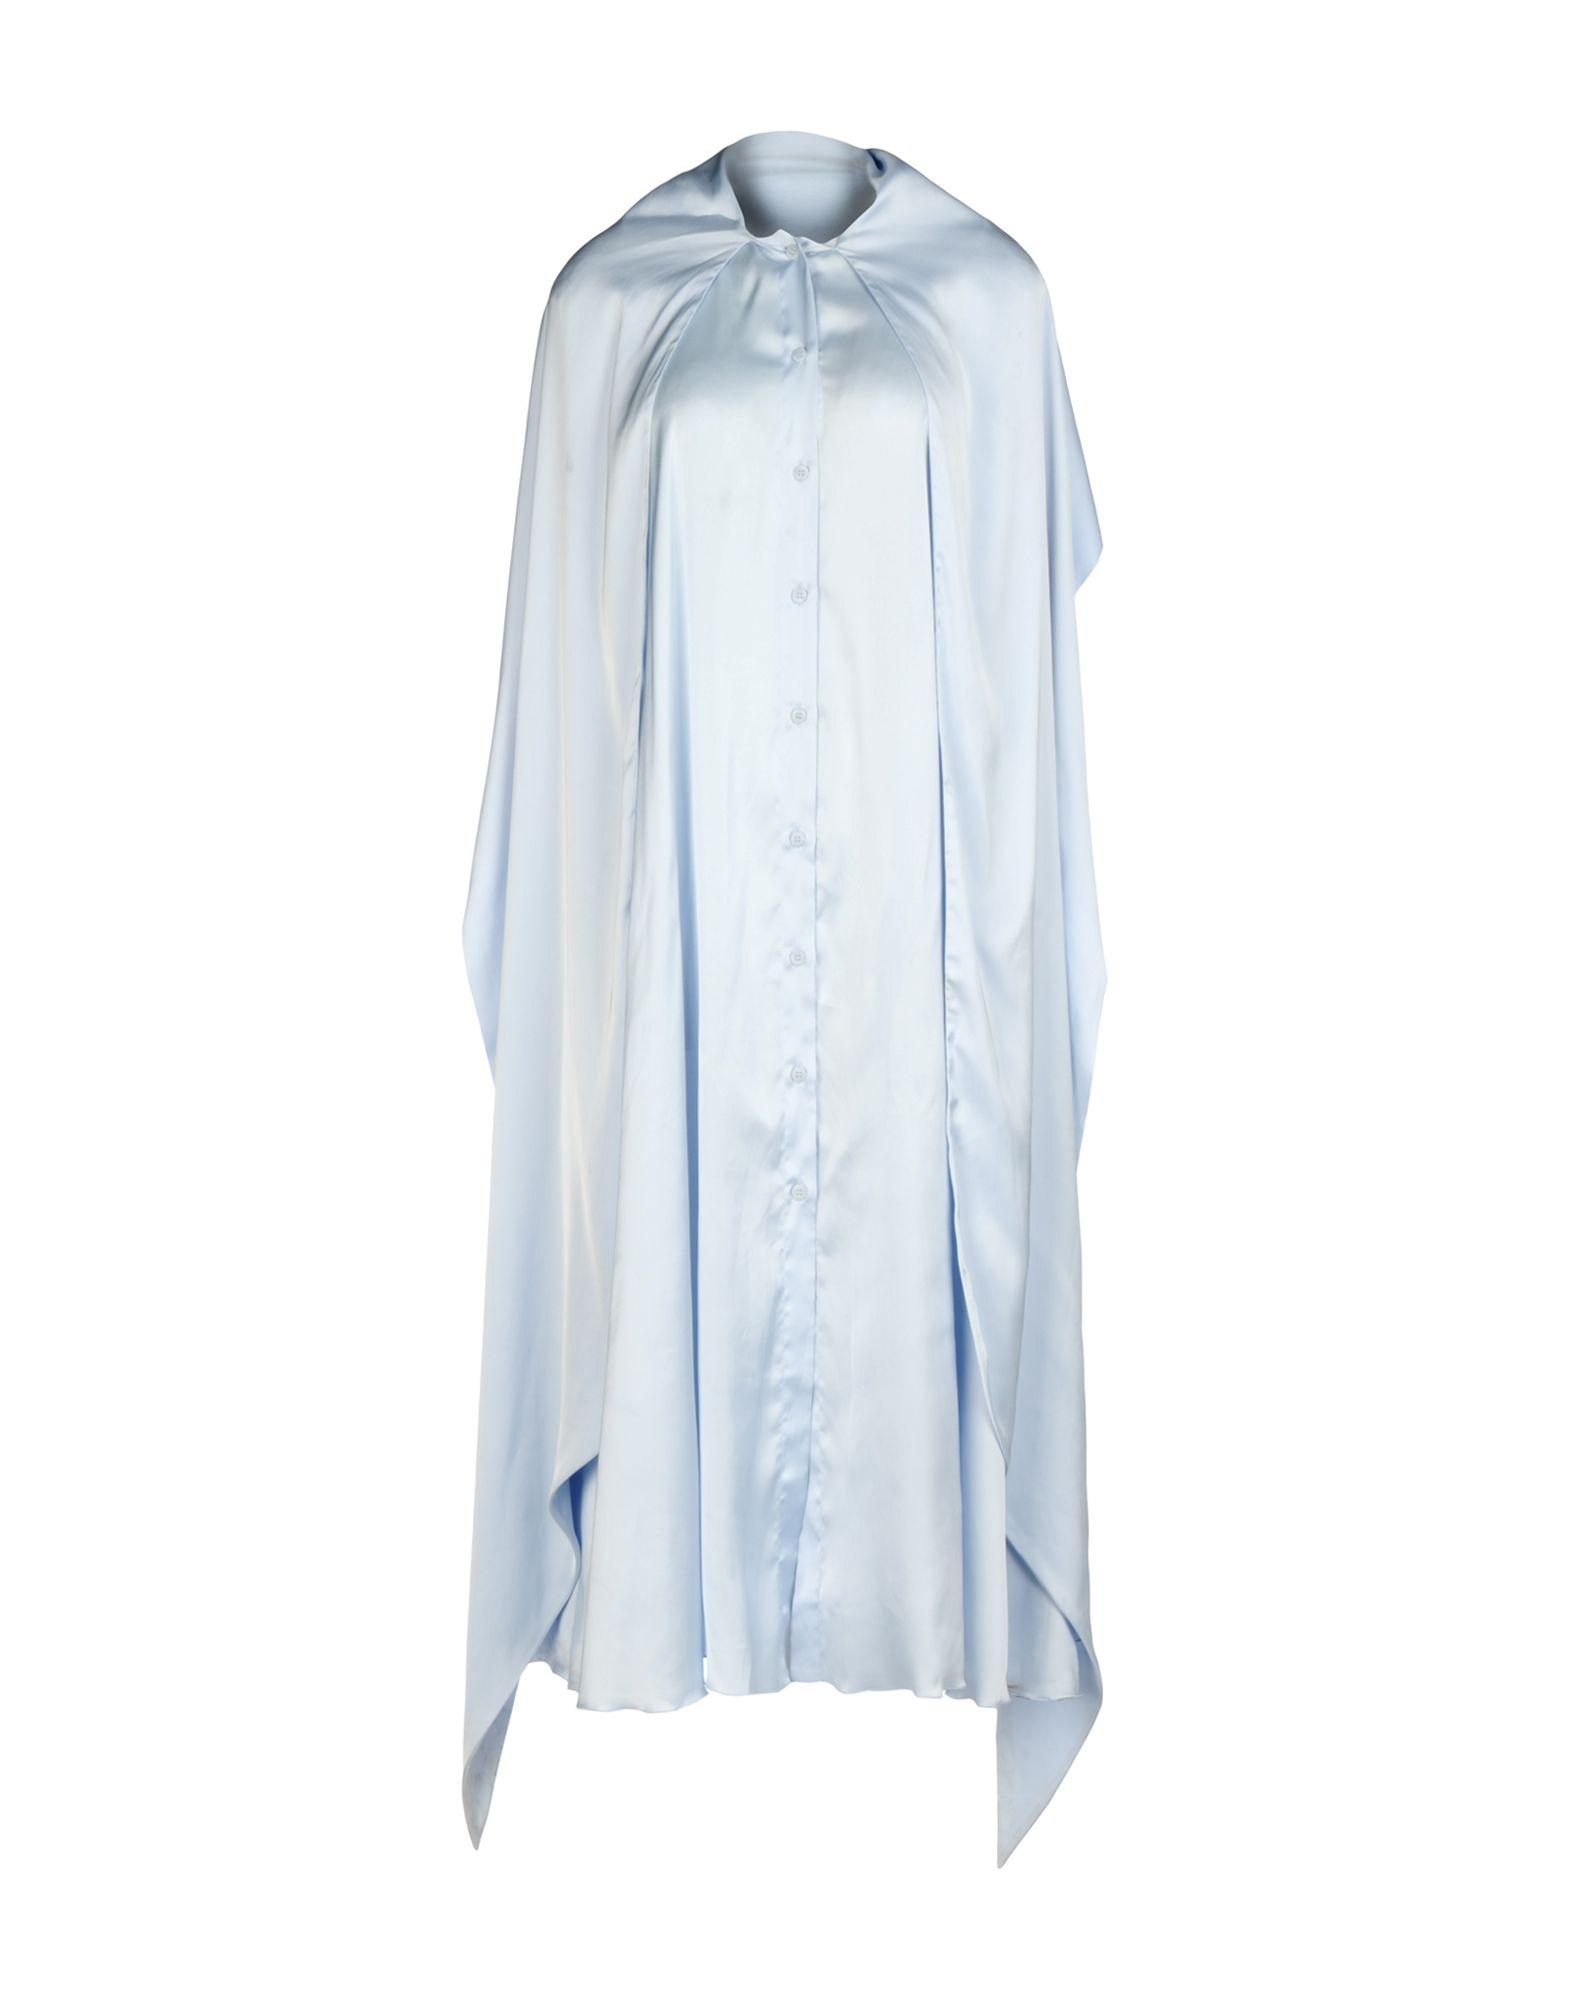 Vestito Cerimonia Mm6 Maison Margiela Donna - Acquista online su udWDceFu